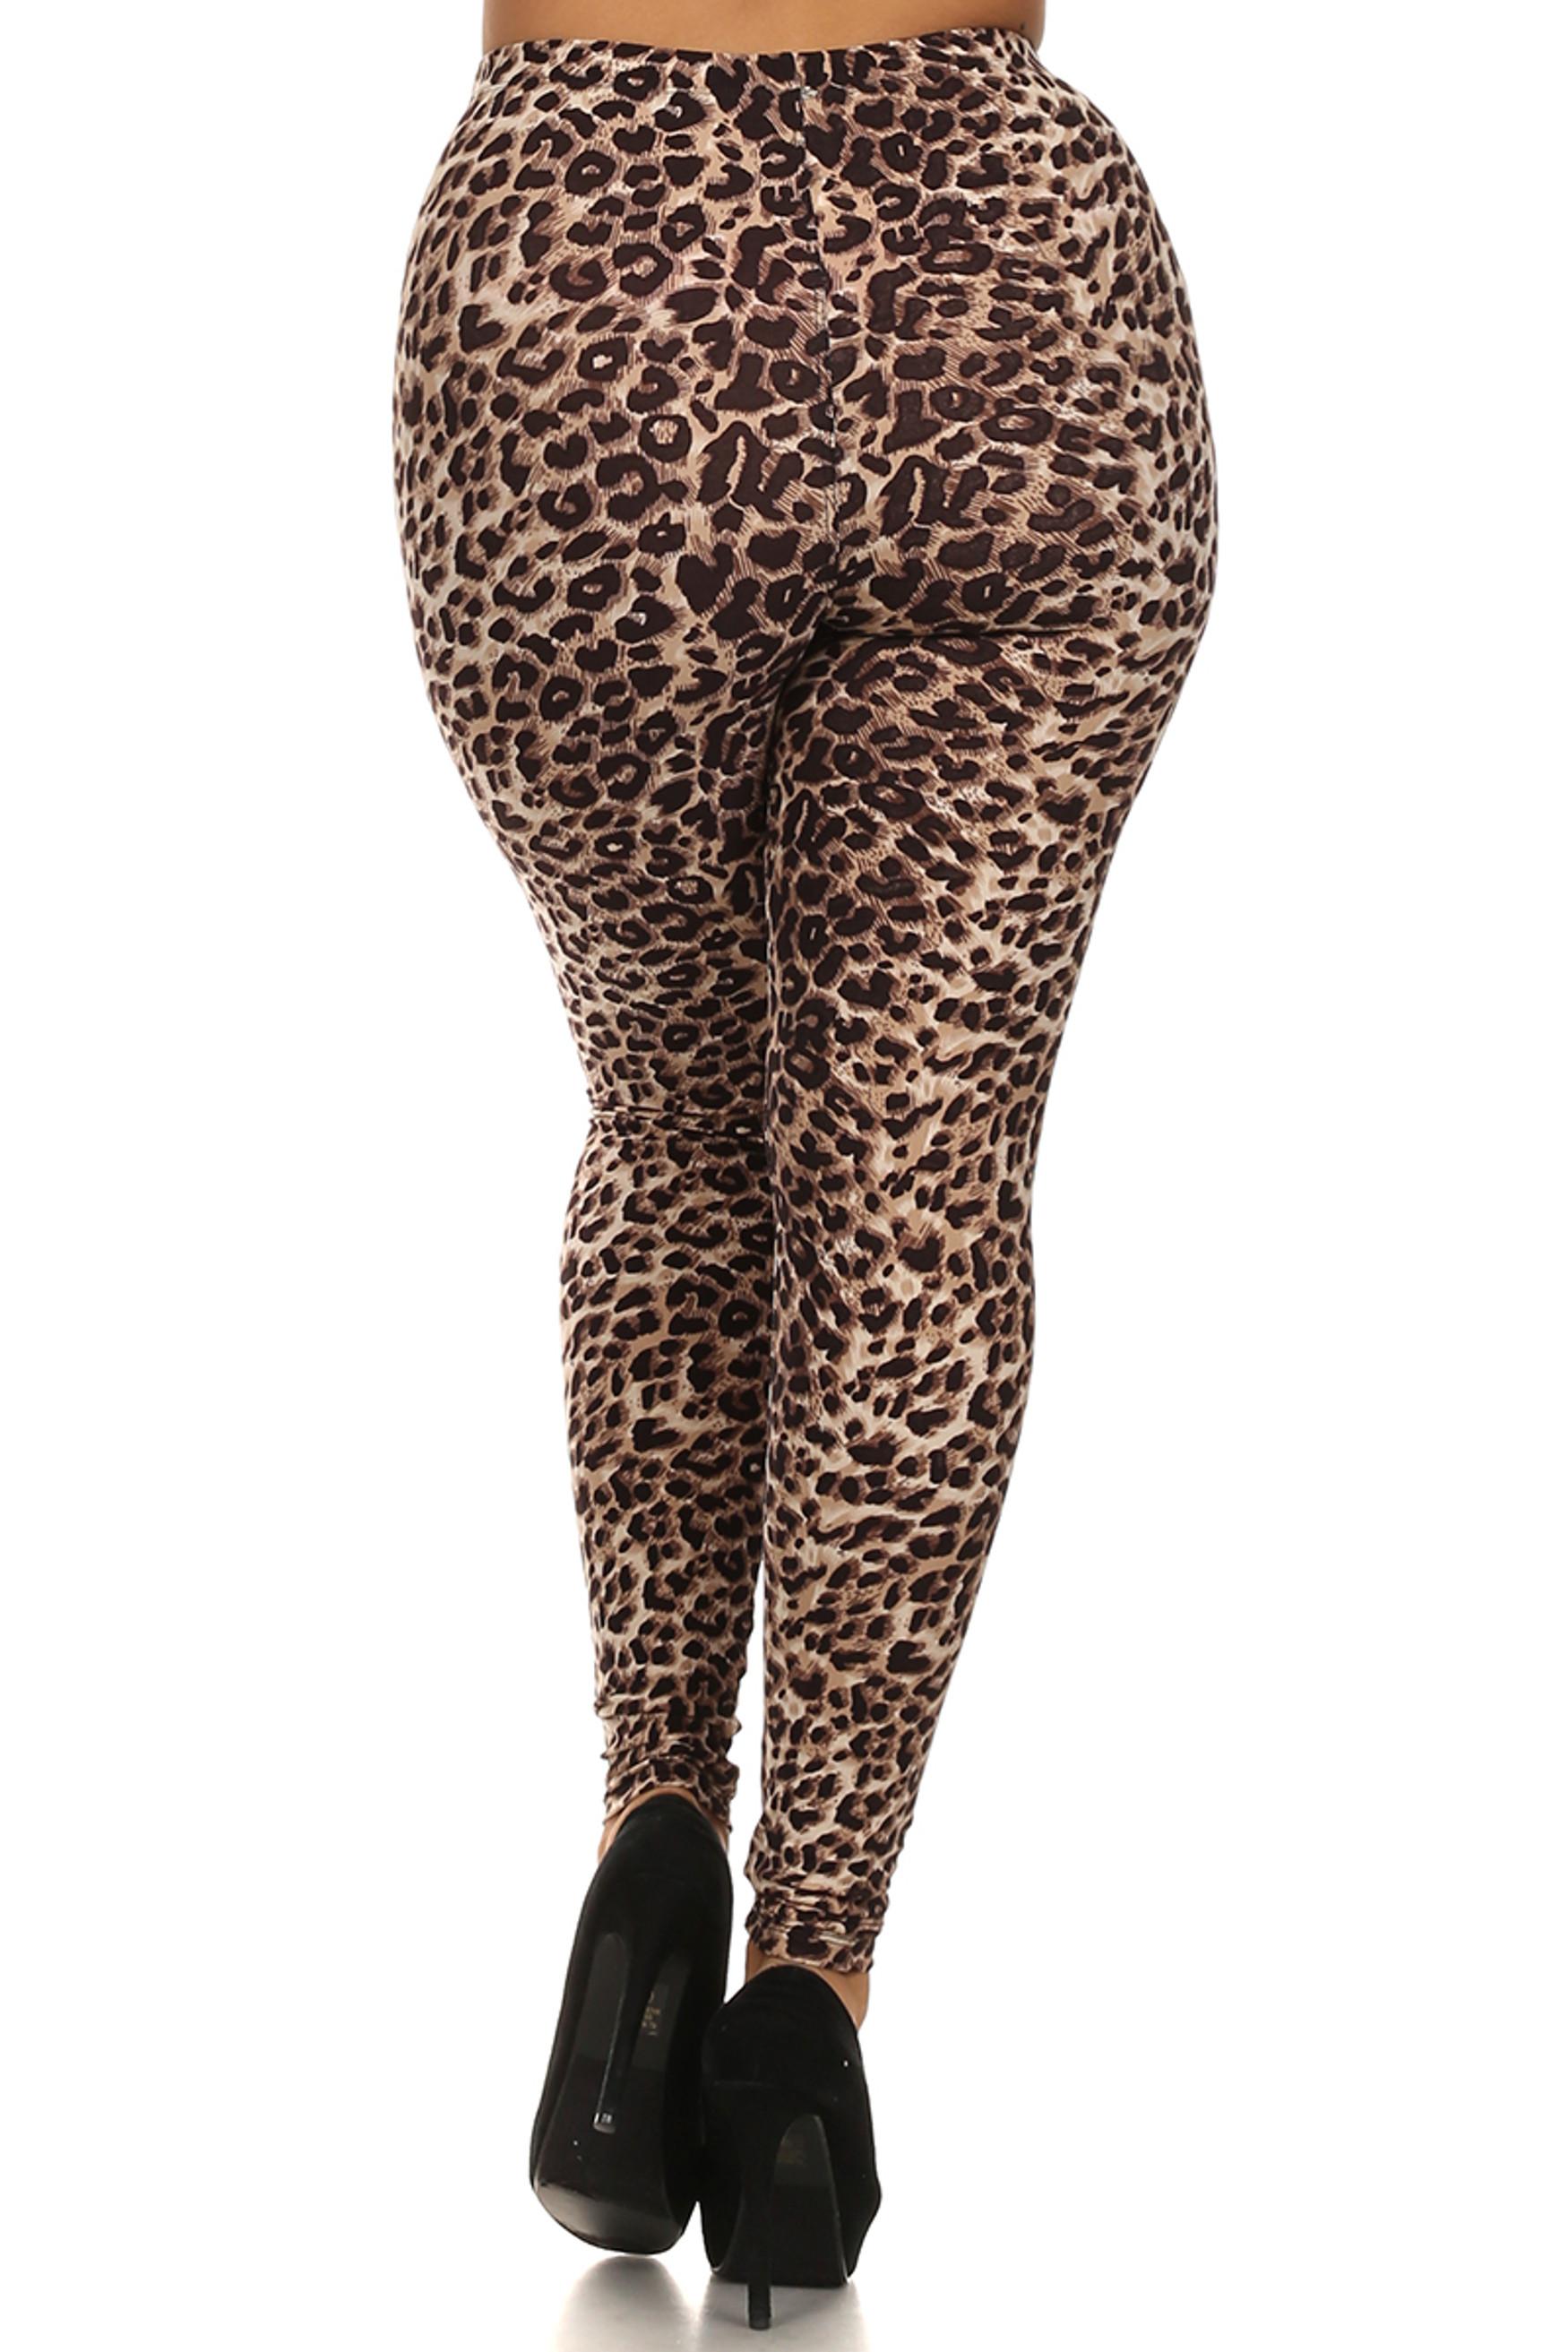 Back side image of Soft Brushed Feral Cheetah Plus Size Leggings